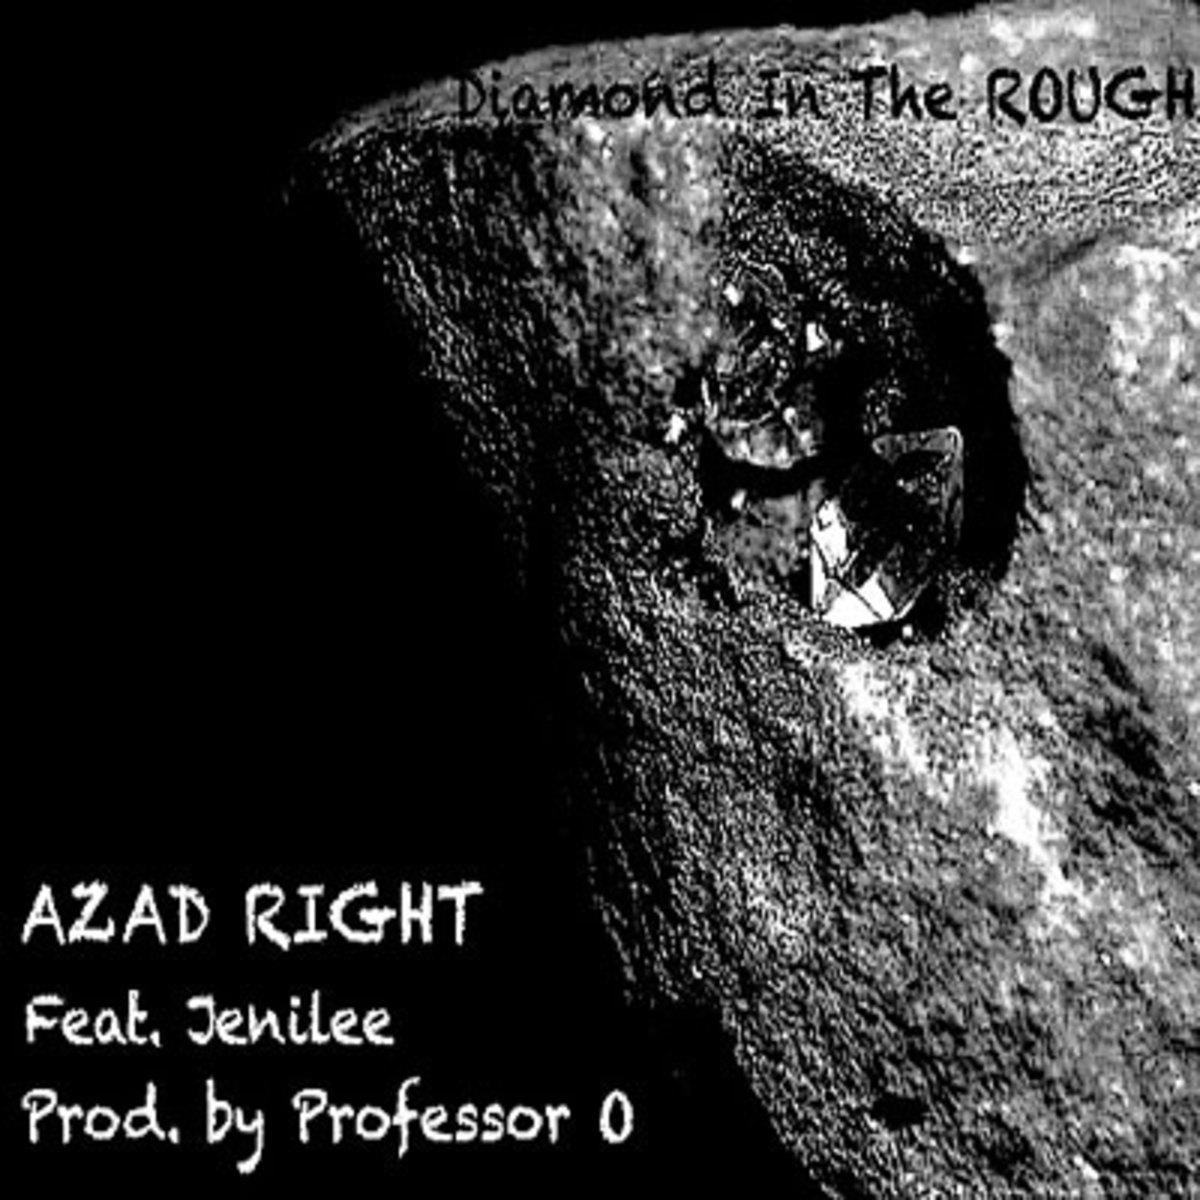 azadright-diamondintherough.jpg